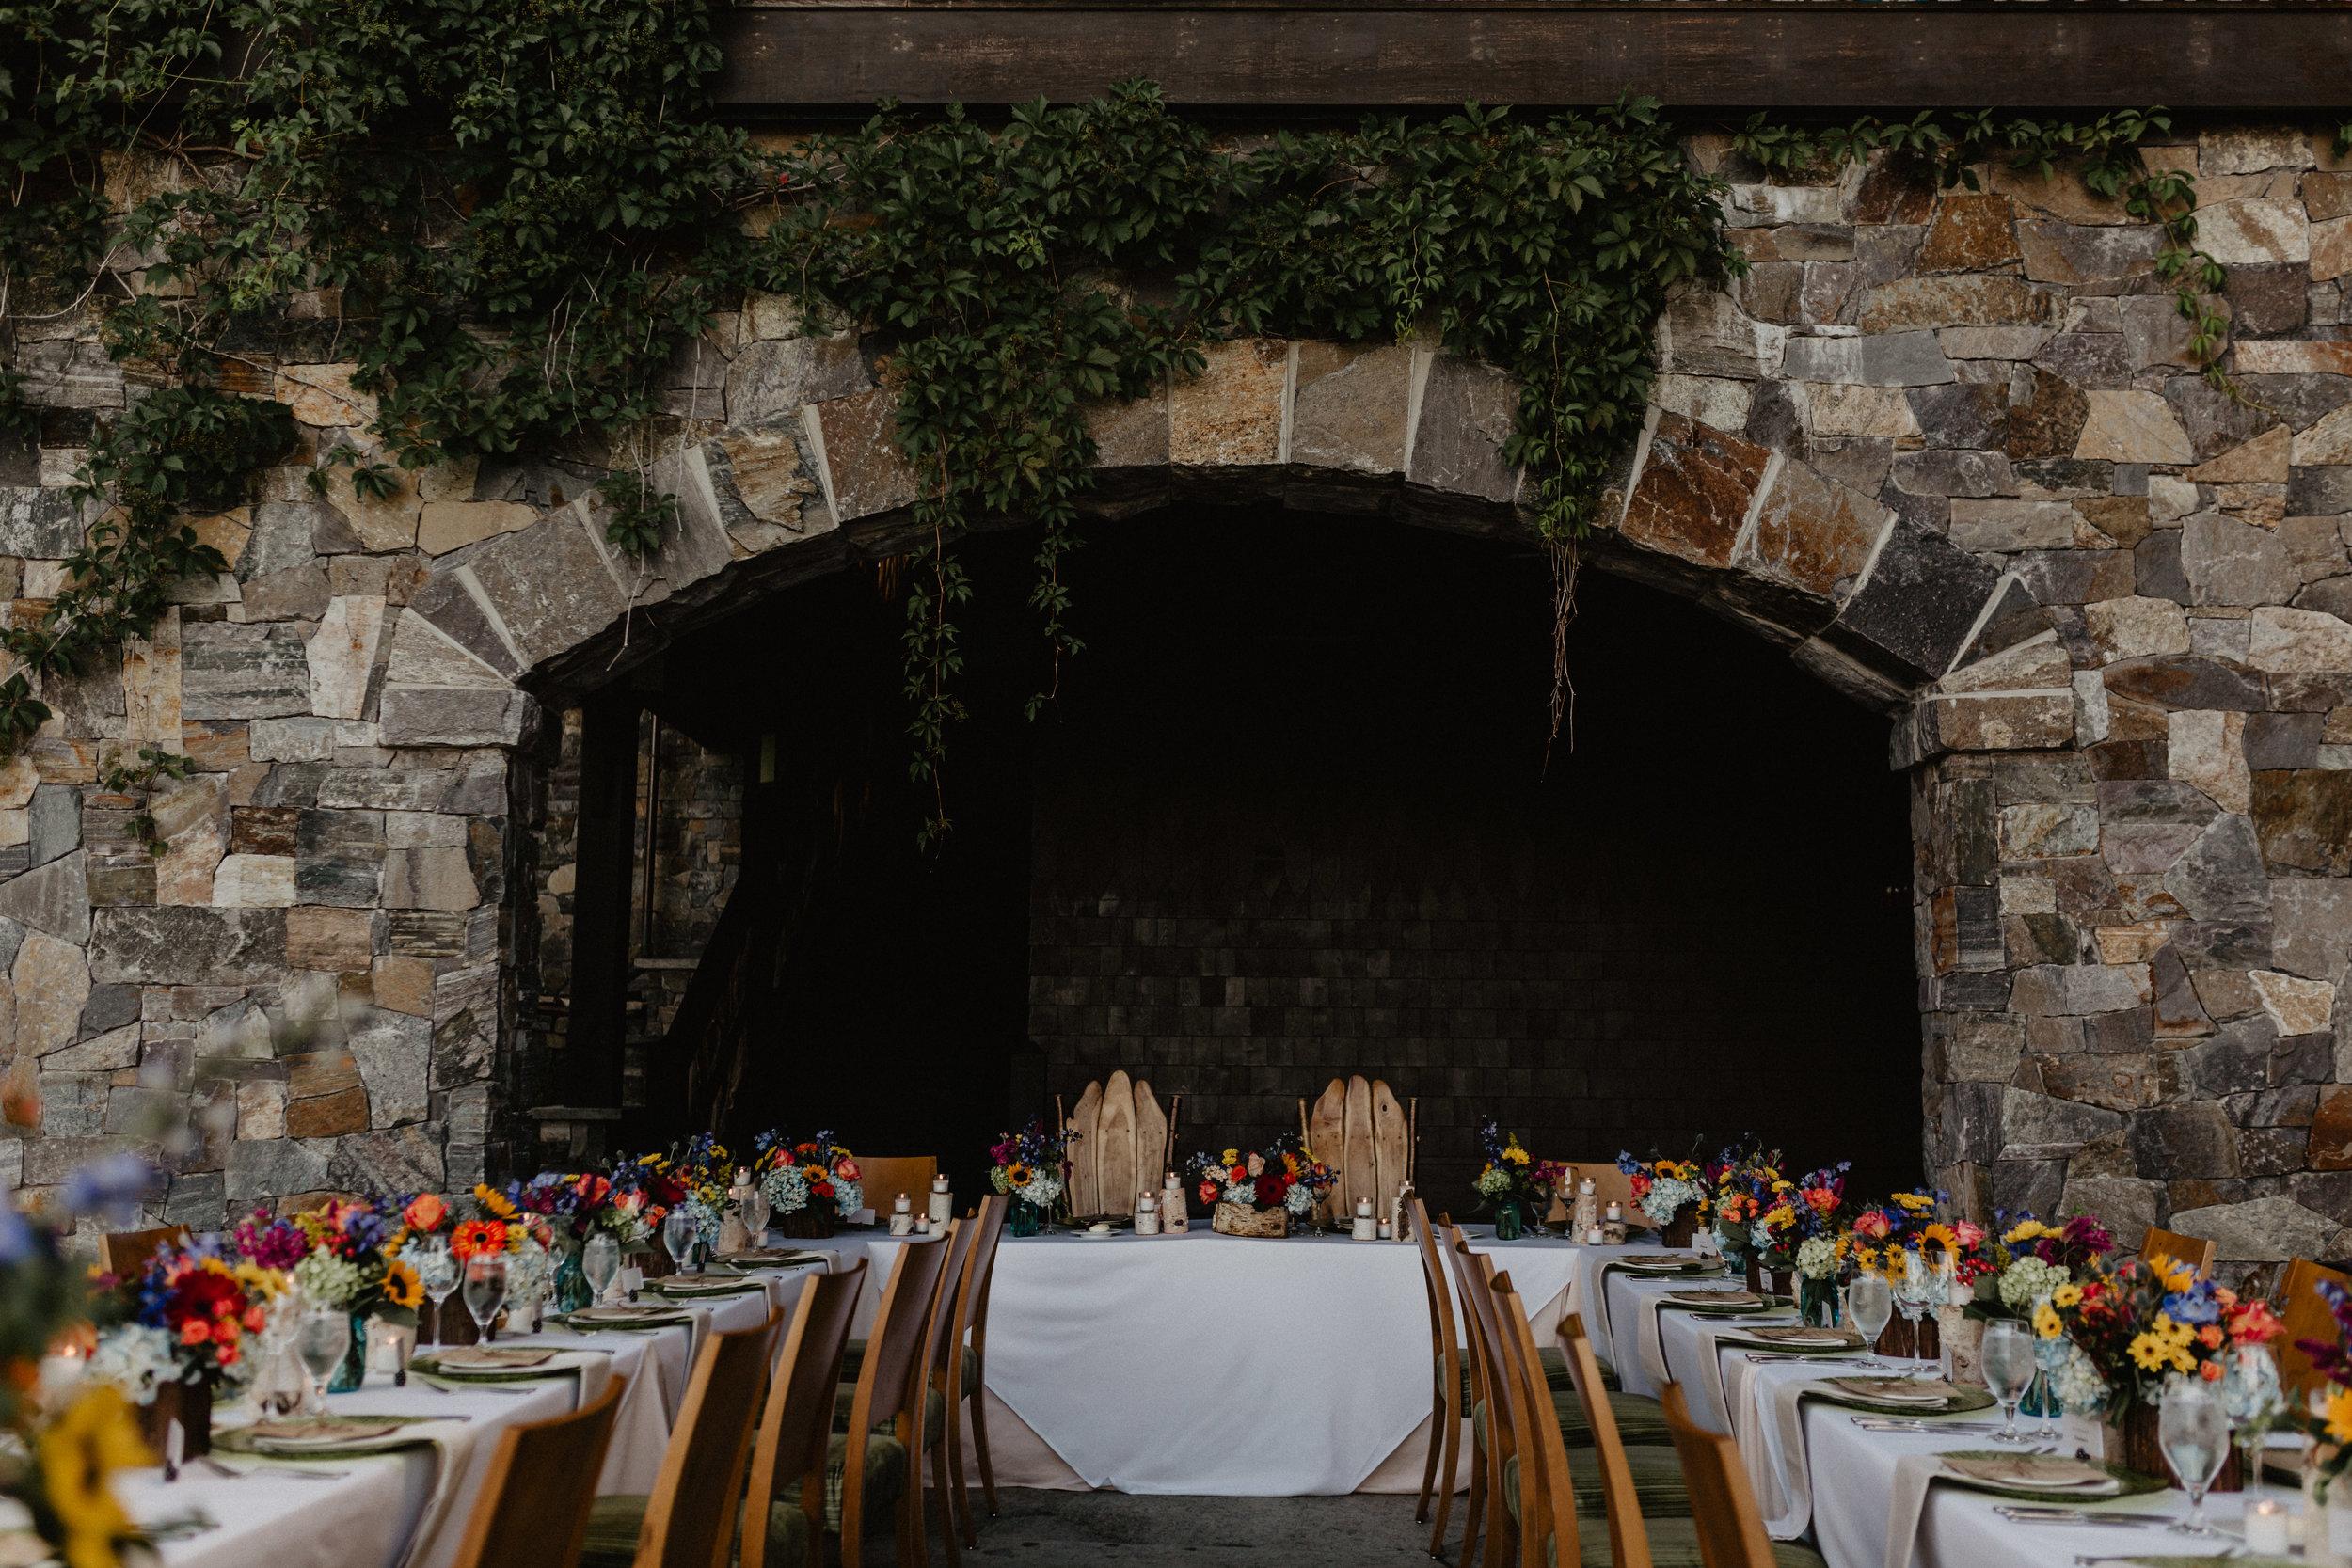 lake_placid_lodge_wedding_047.jpg